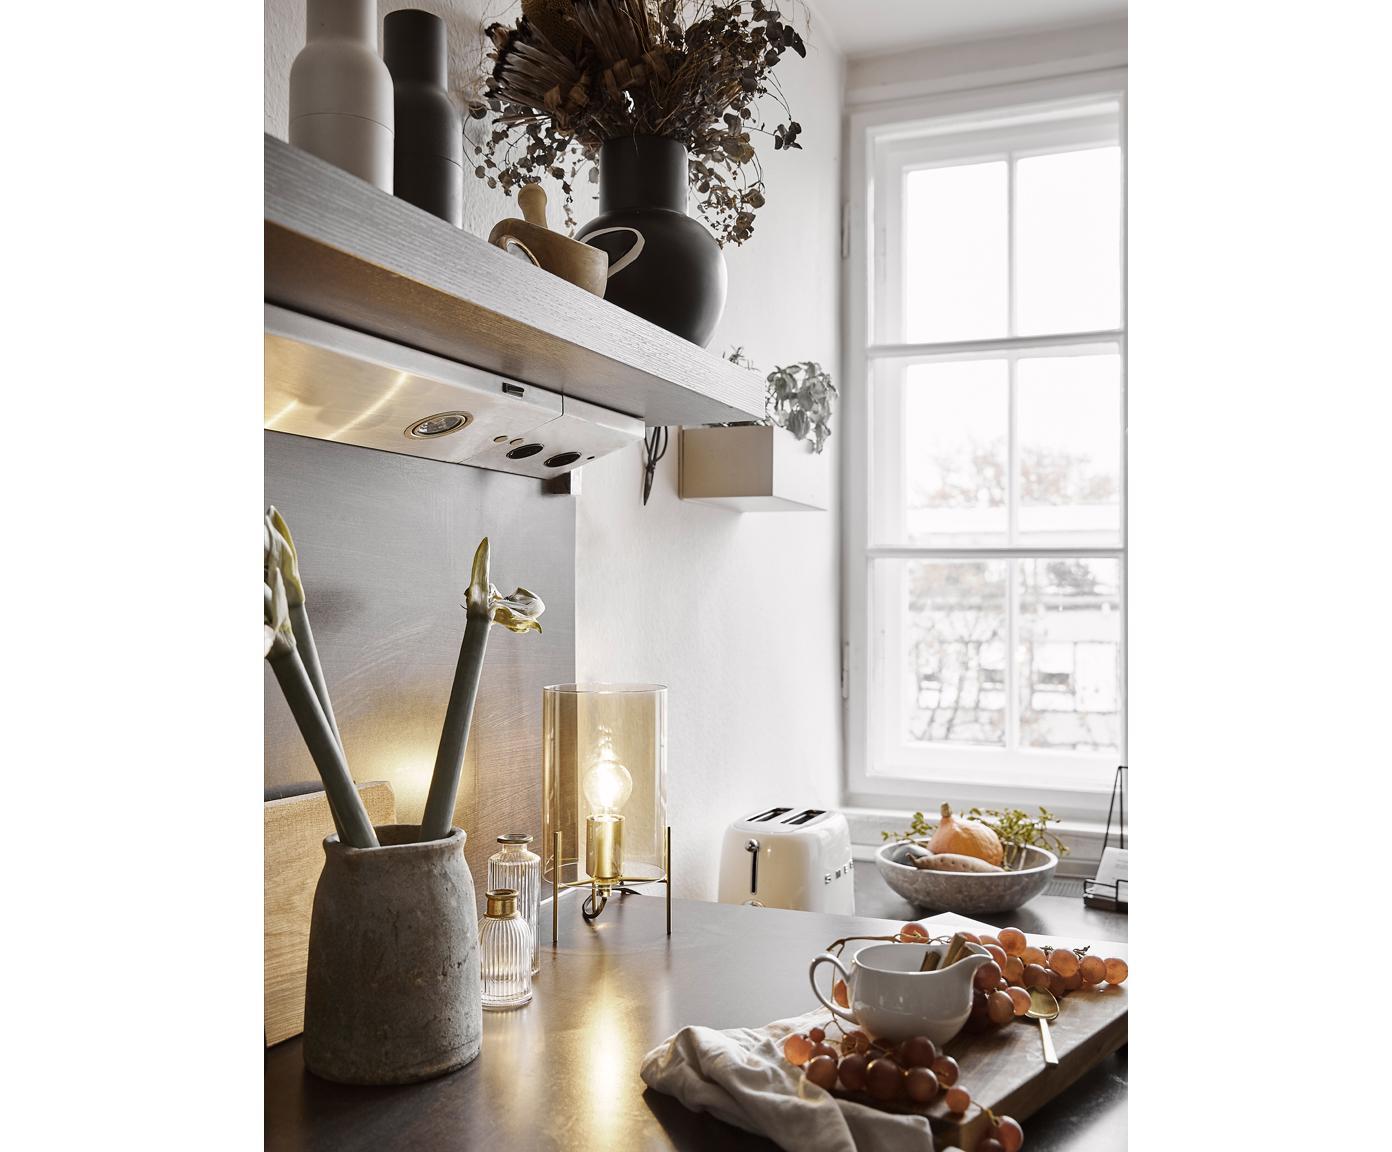 Tafellamp Laurel, Lampvoet: geborsteld metaal, Lampenkap: glas, Lampenkap: amberkleurig. Lampvoet: messingkleurig. Snoer: transparant, Ø 14 x H 28 cm